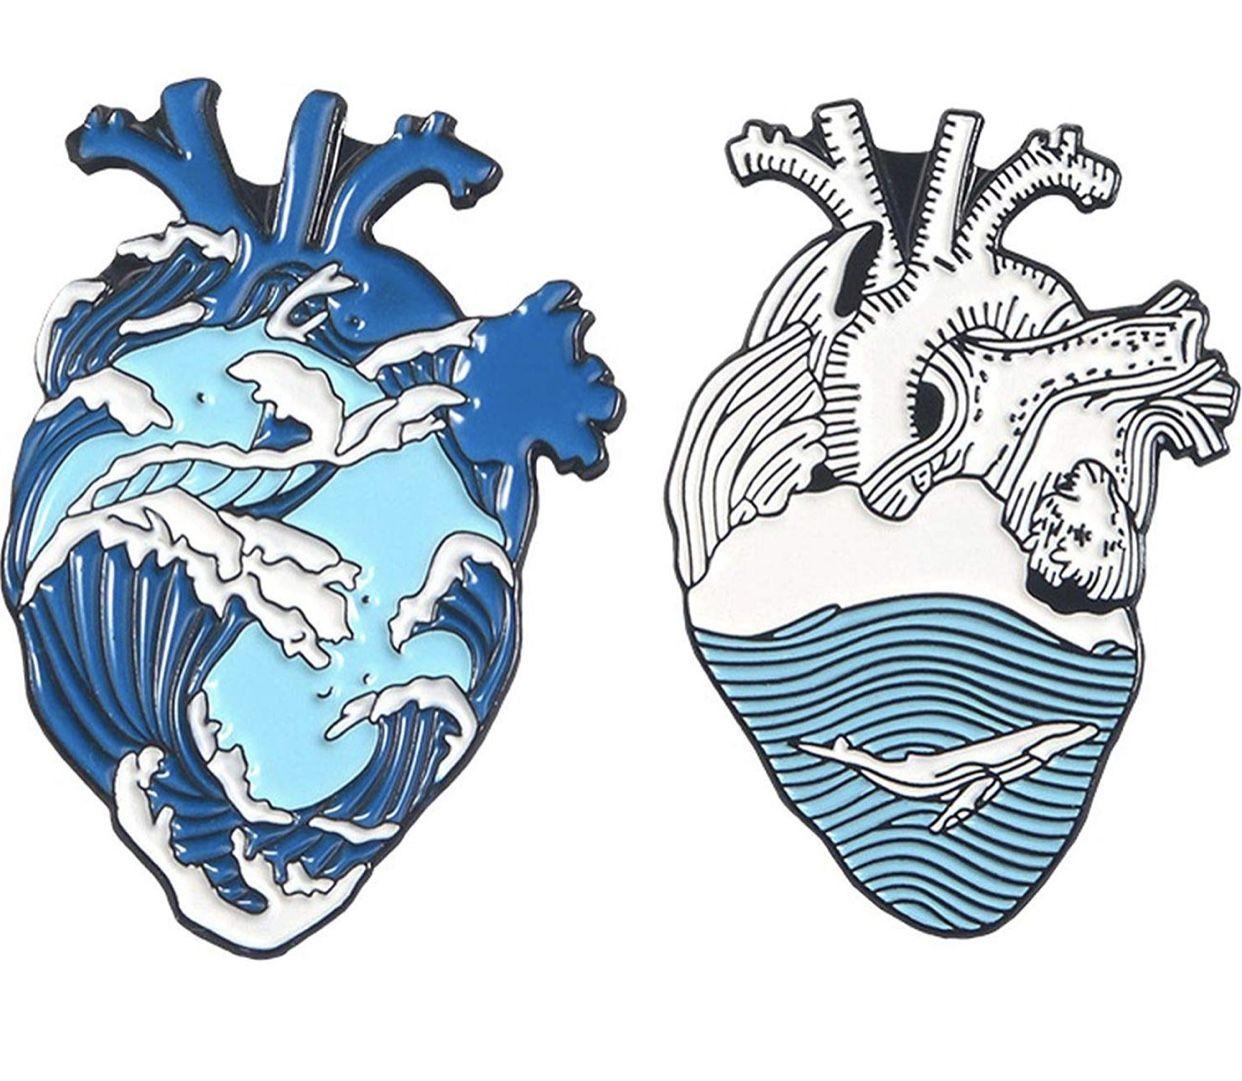 46+ Ocean heart info